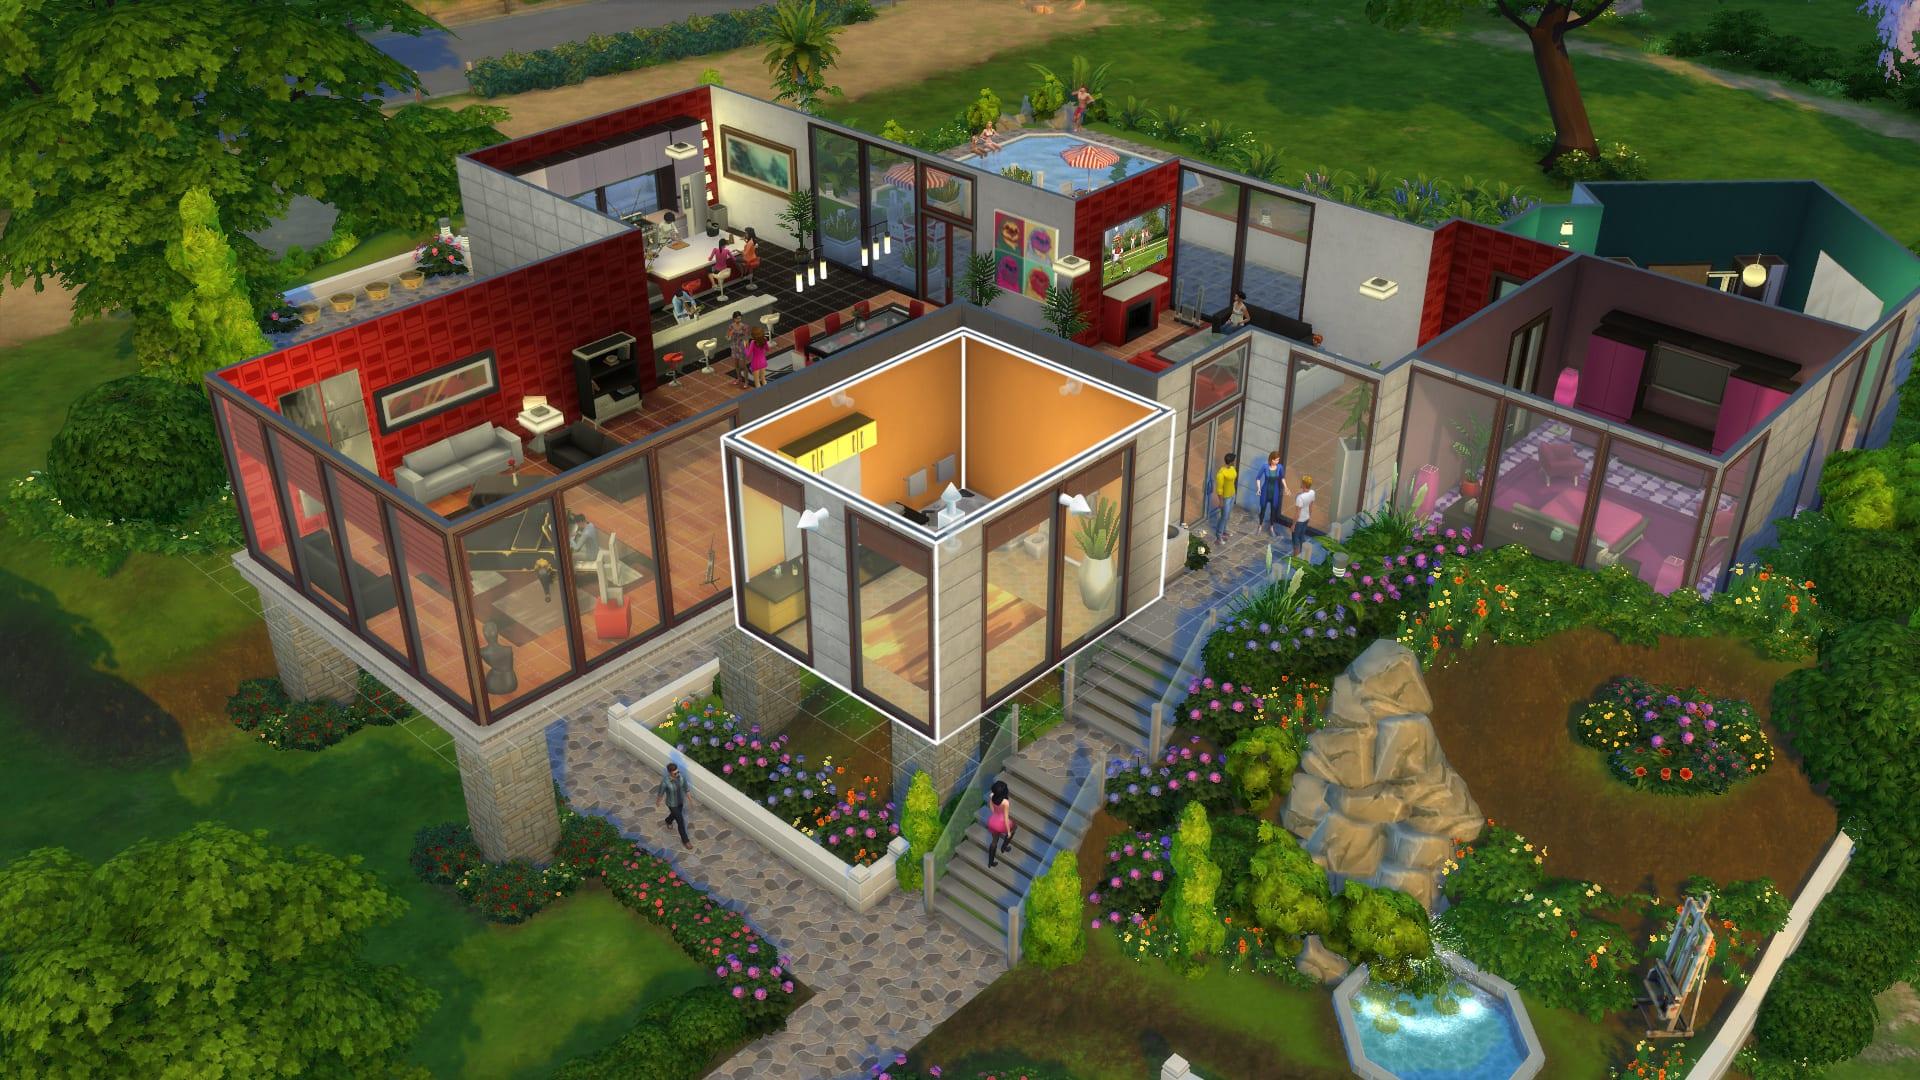 sims 4, buy a house